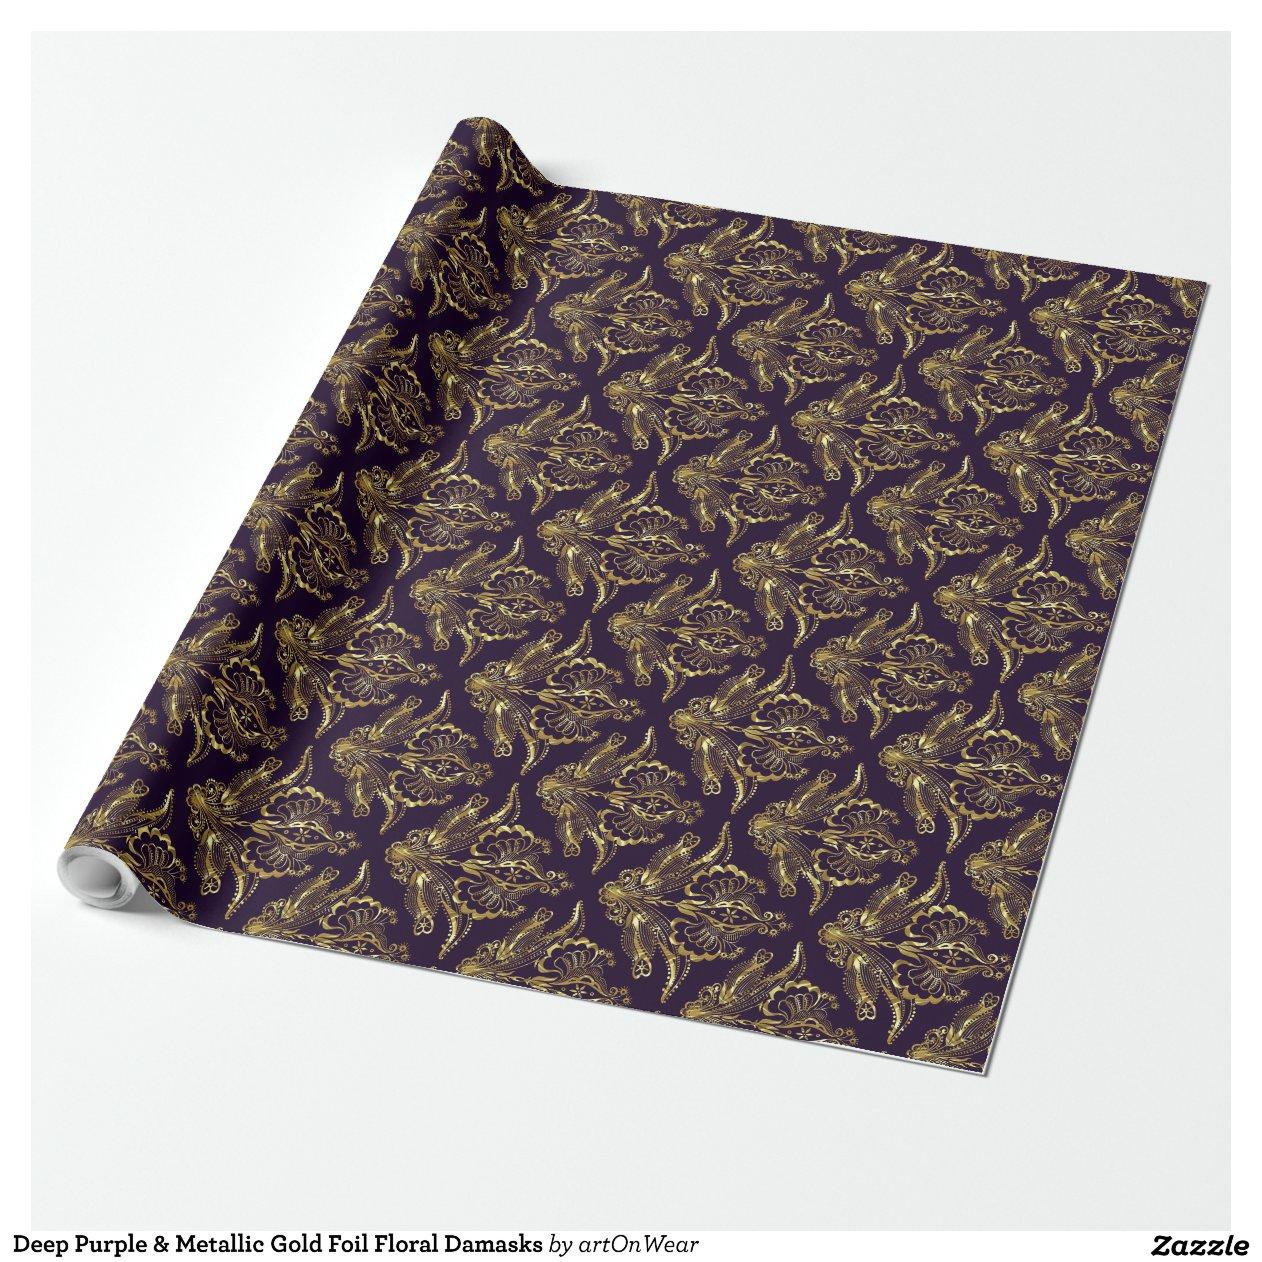 Deep Purple & Metallic Gold Foil Floral Damasks Wrapping Paper Zazzle